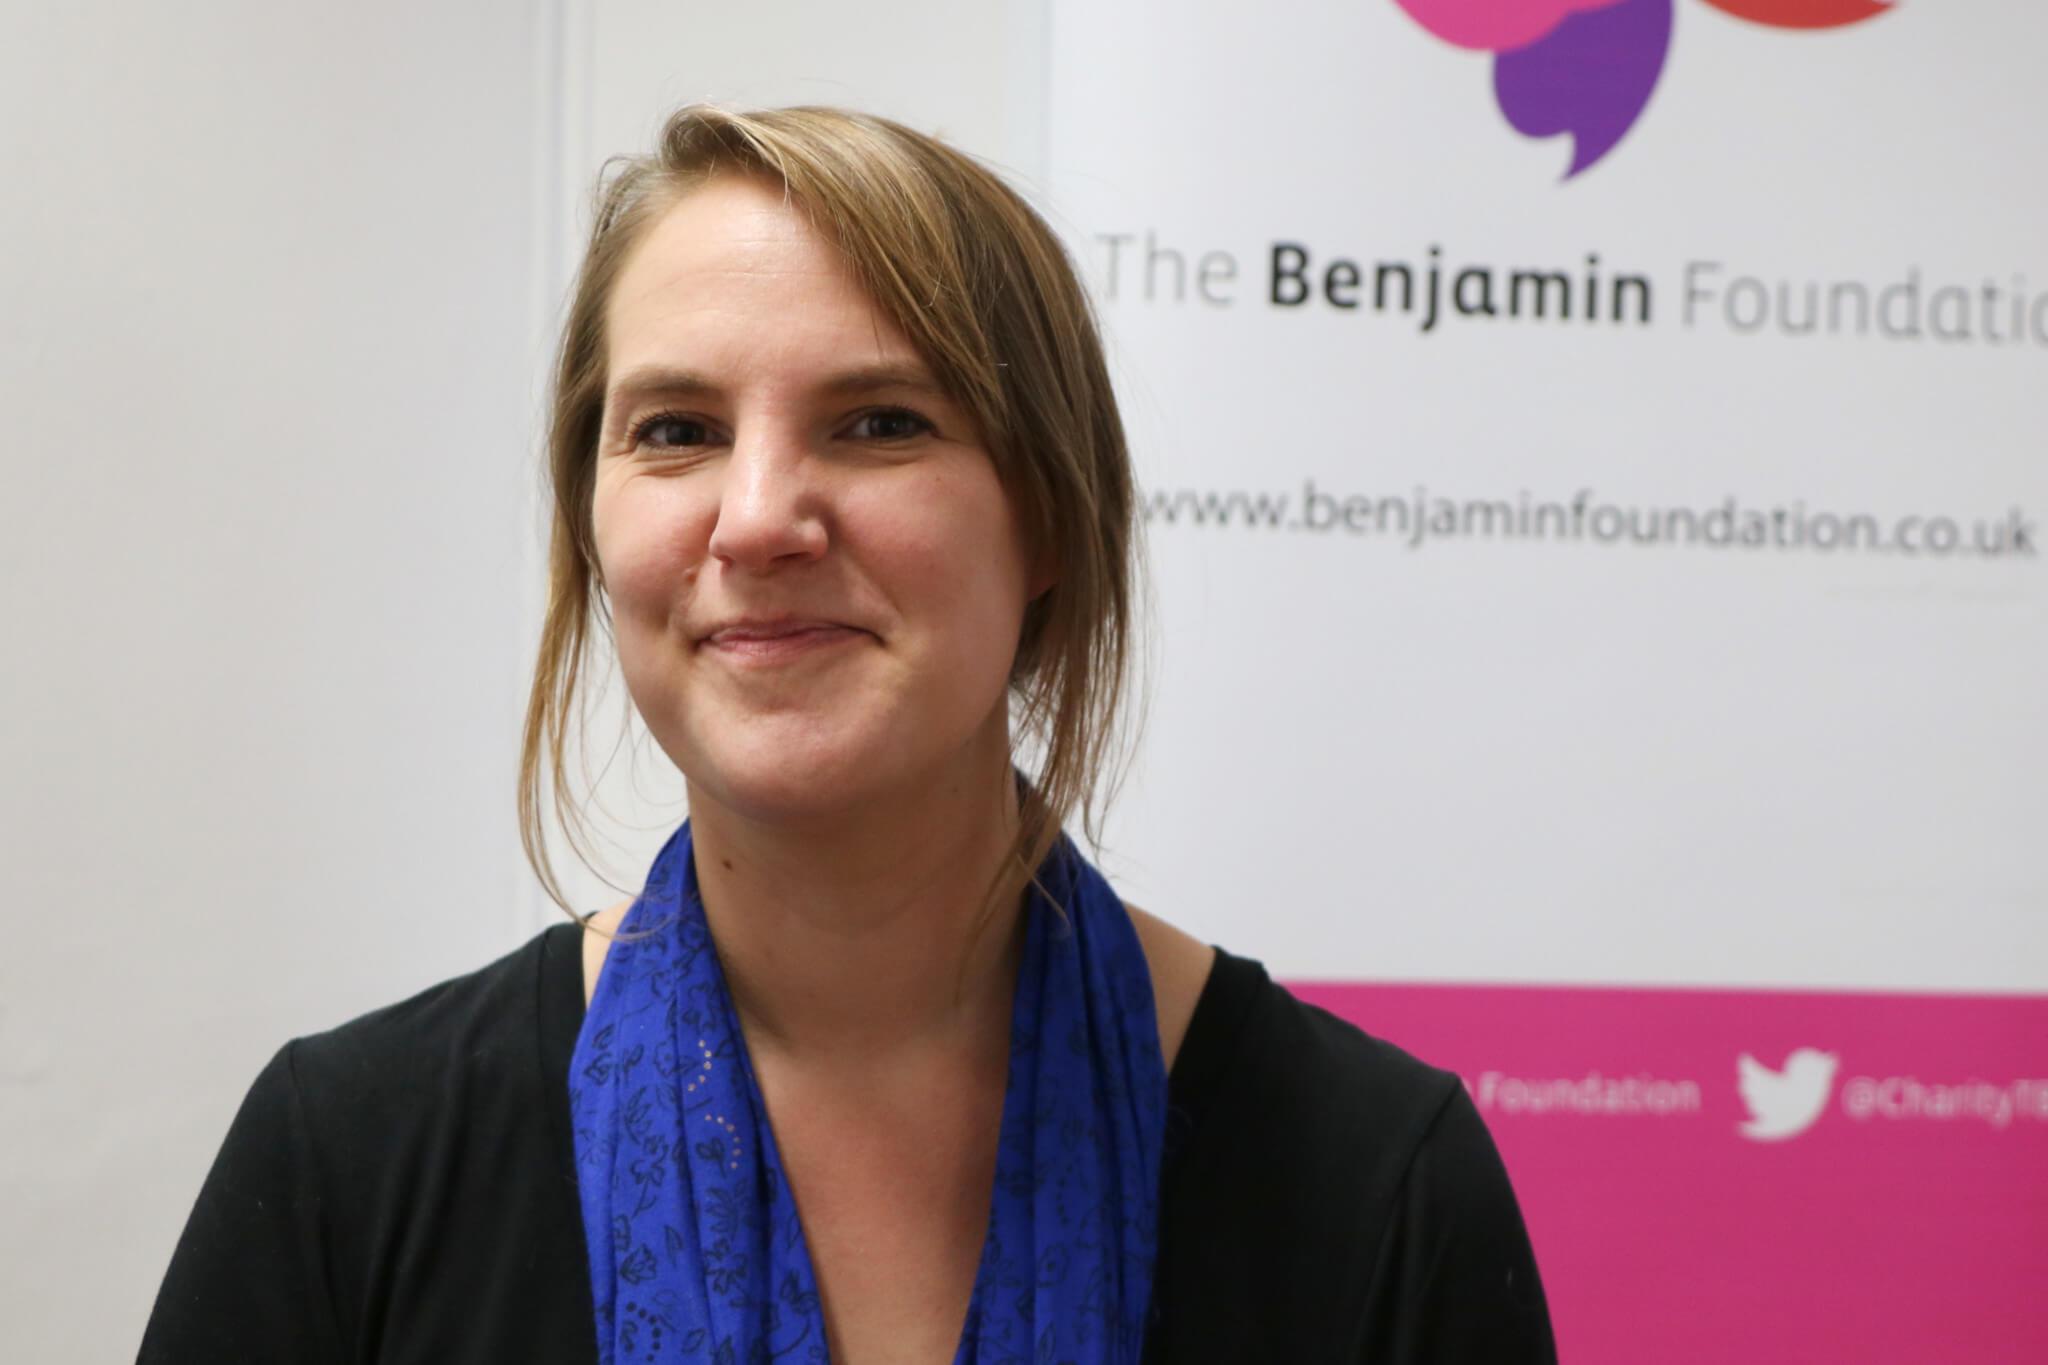 Gemma Walpole's profile image